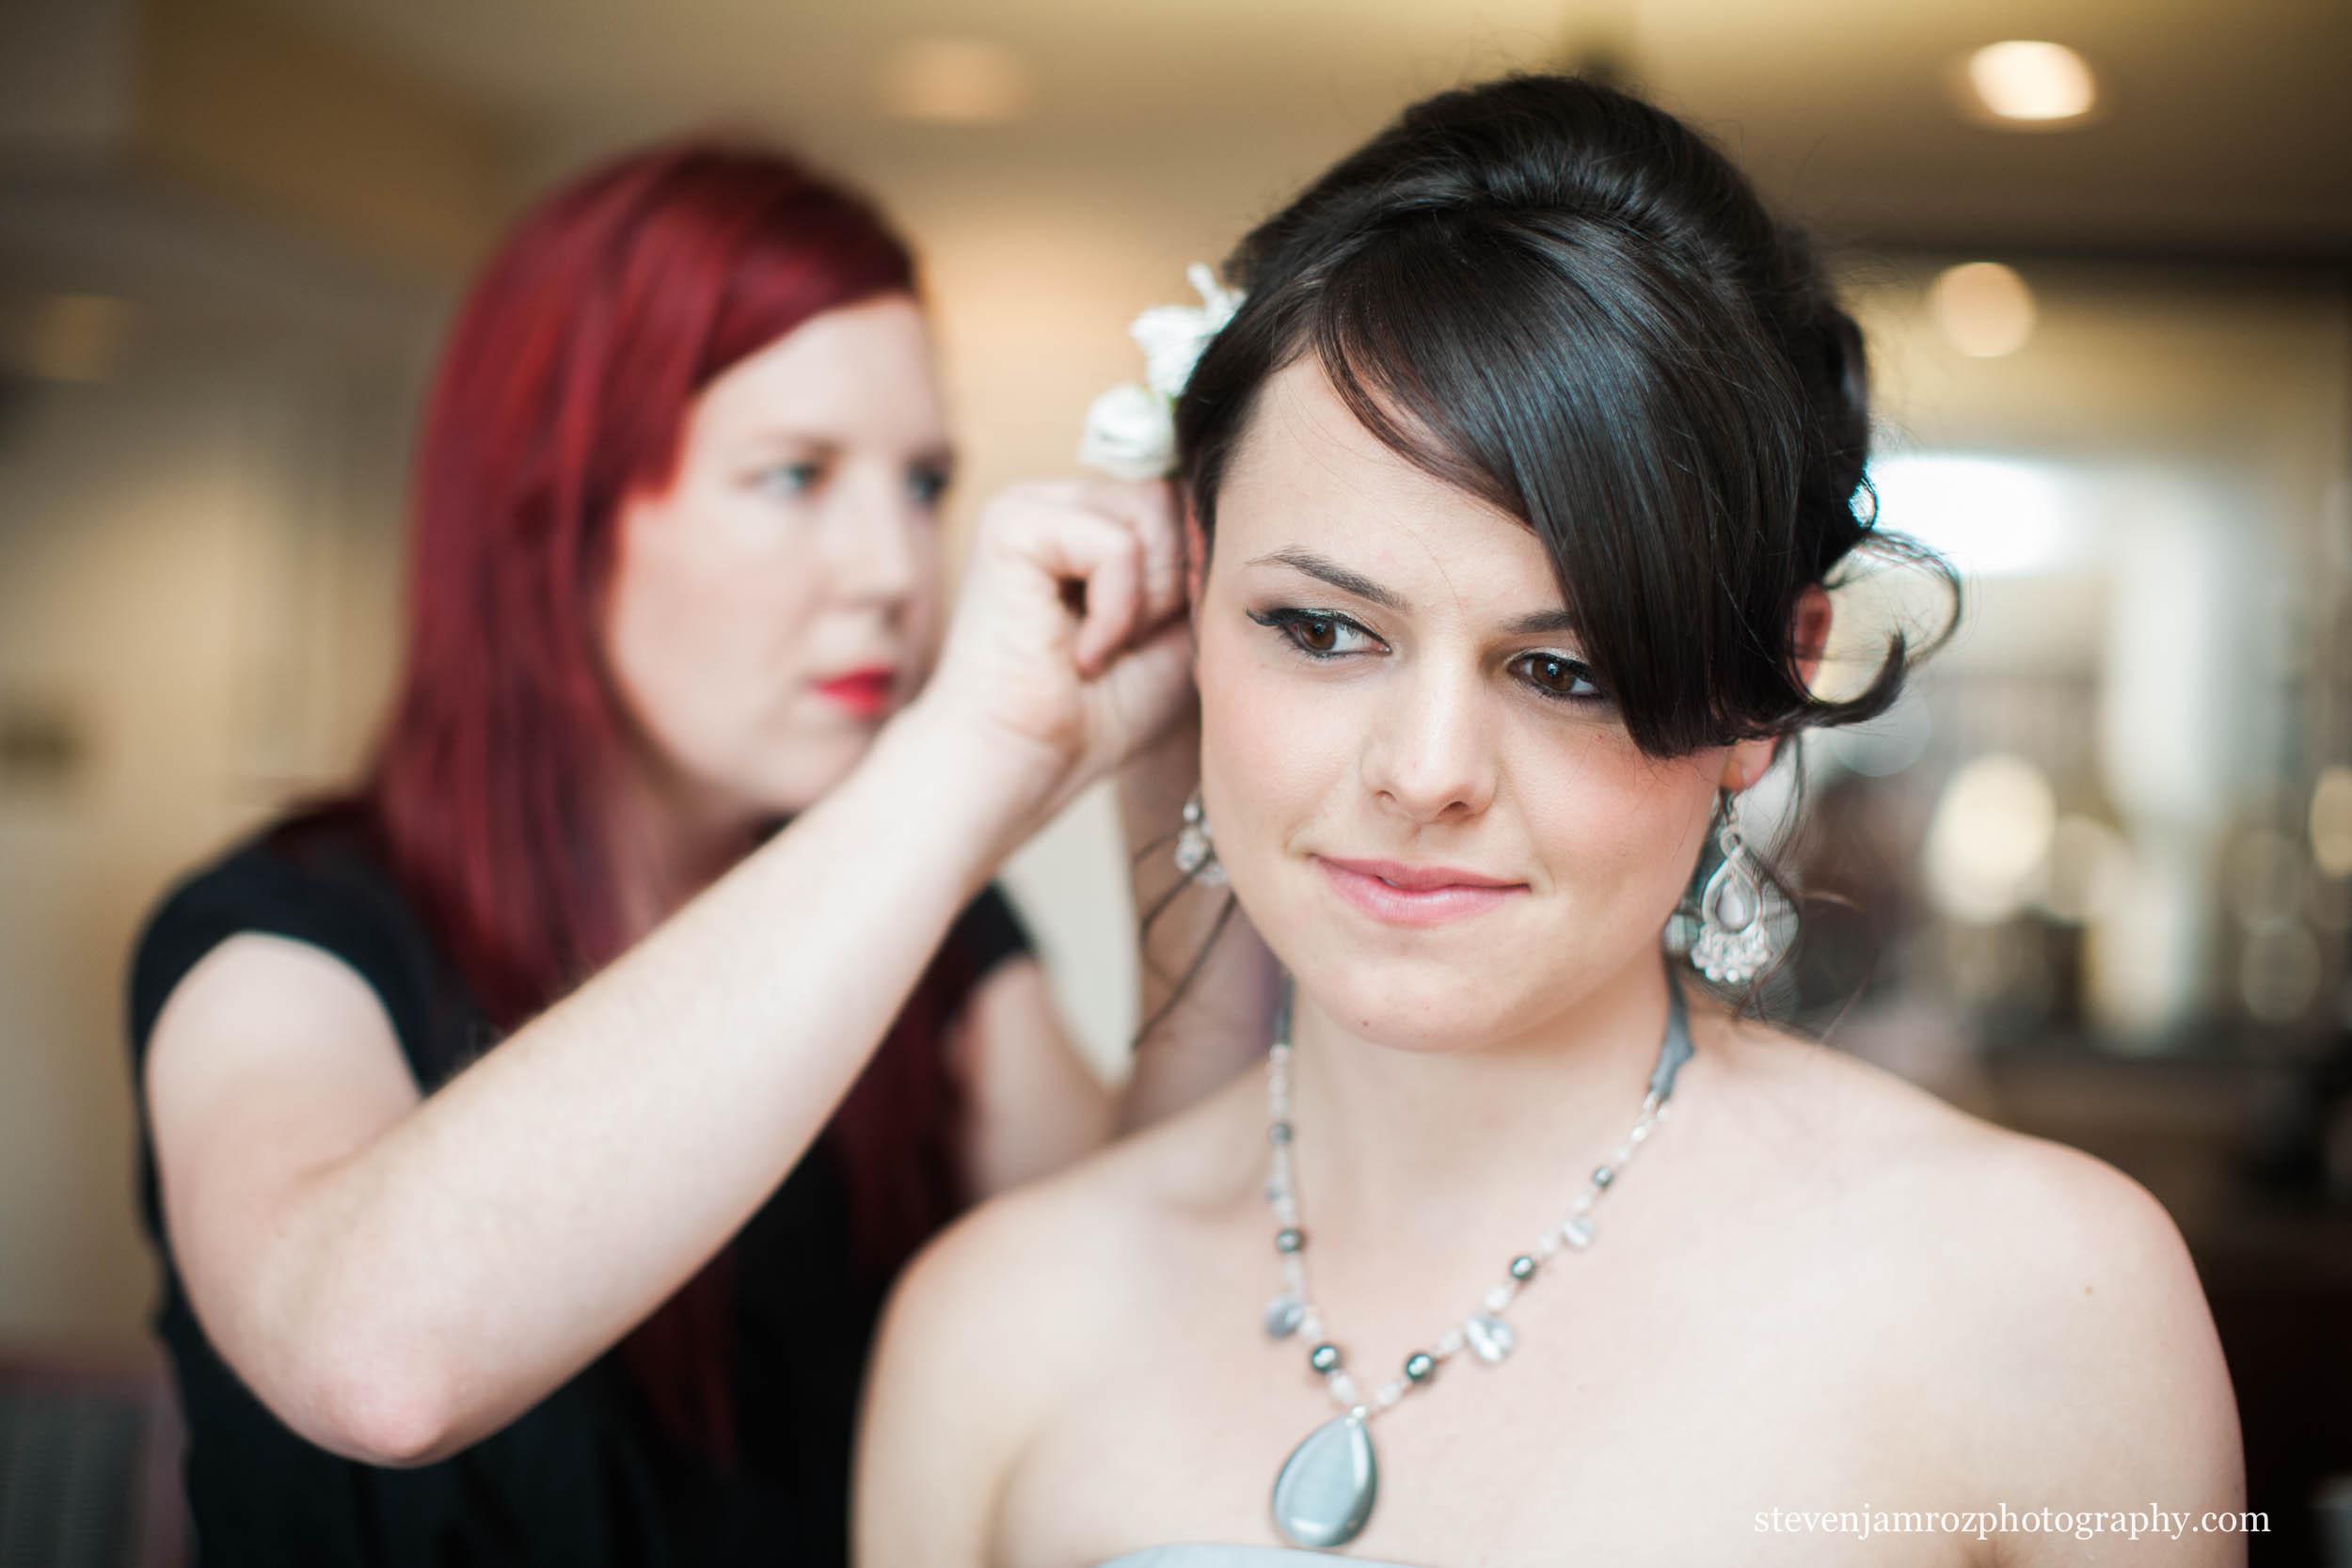 getting-ready-wedding-steven-jamroz-photography-0232.jpg